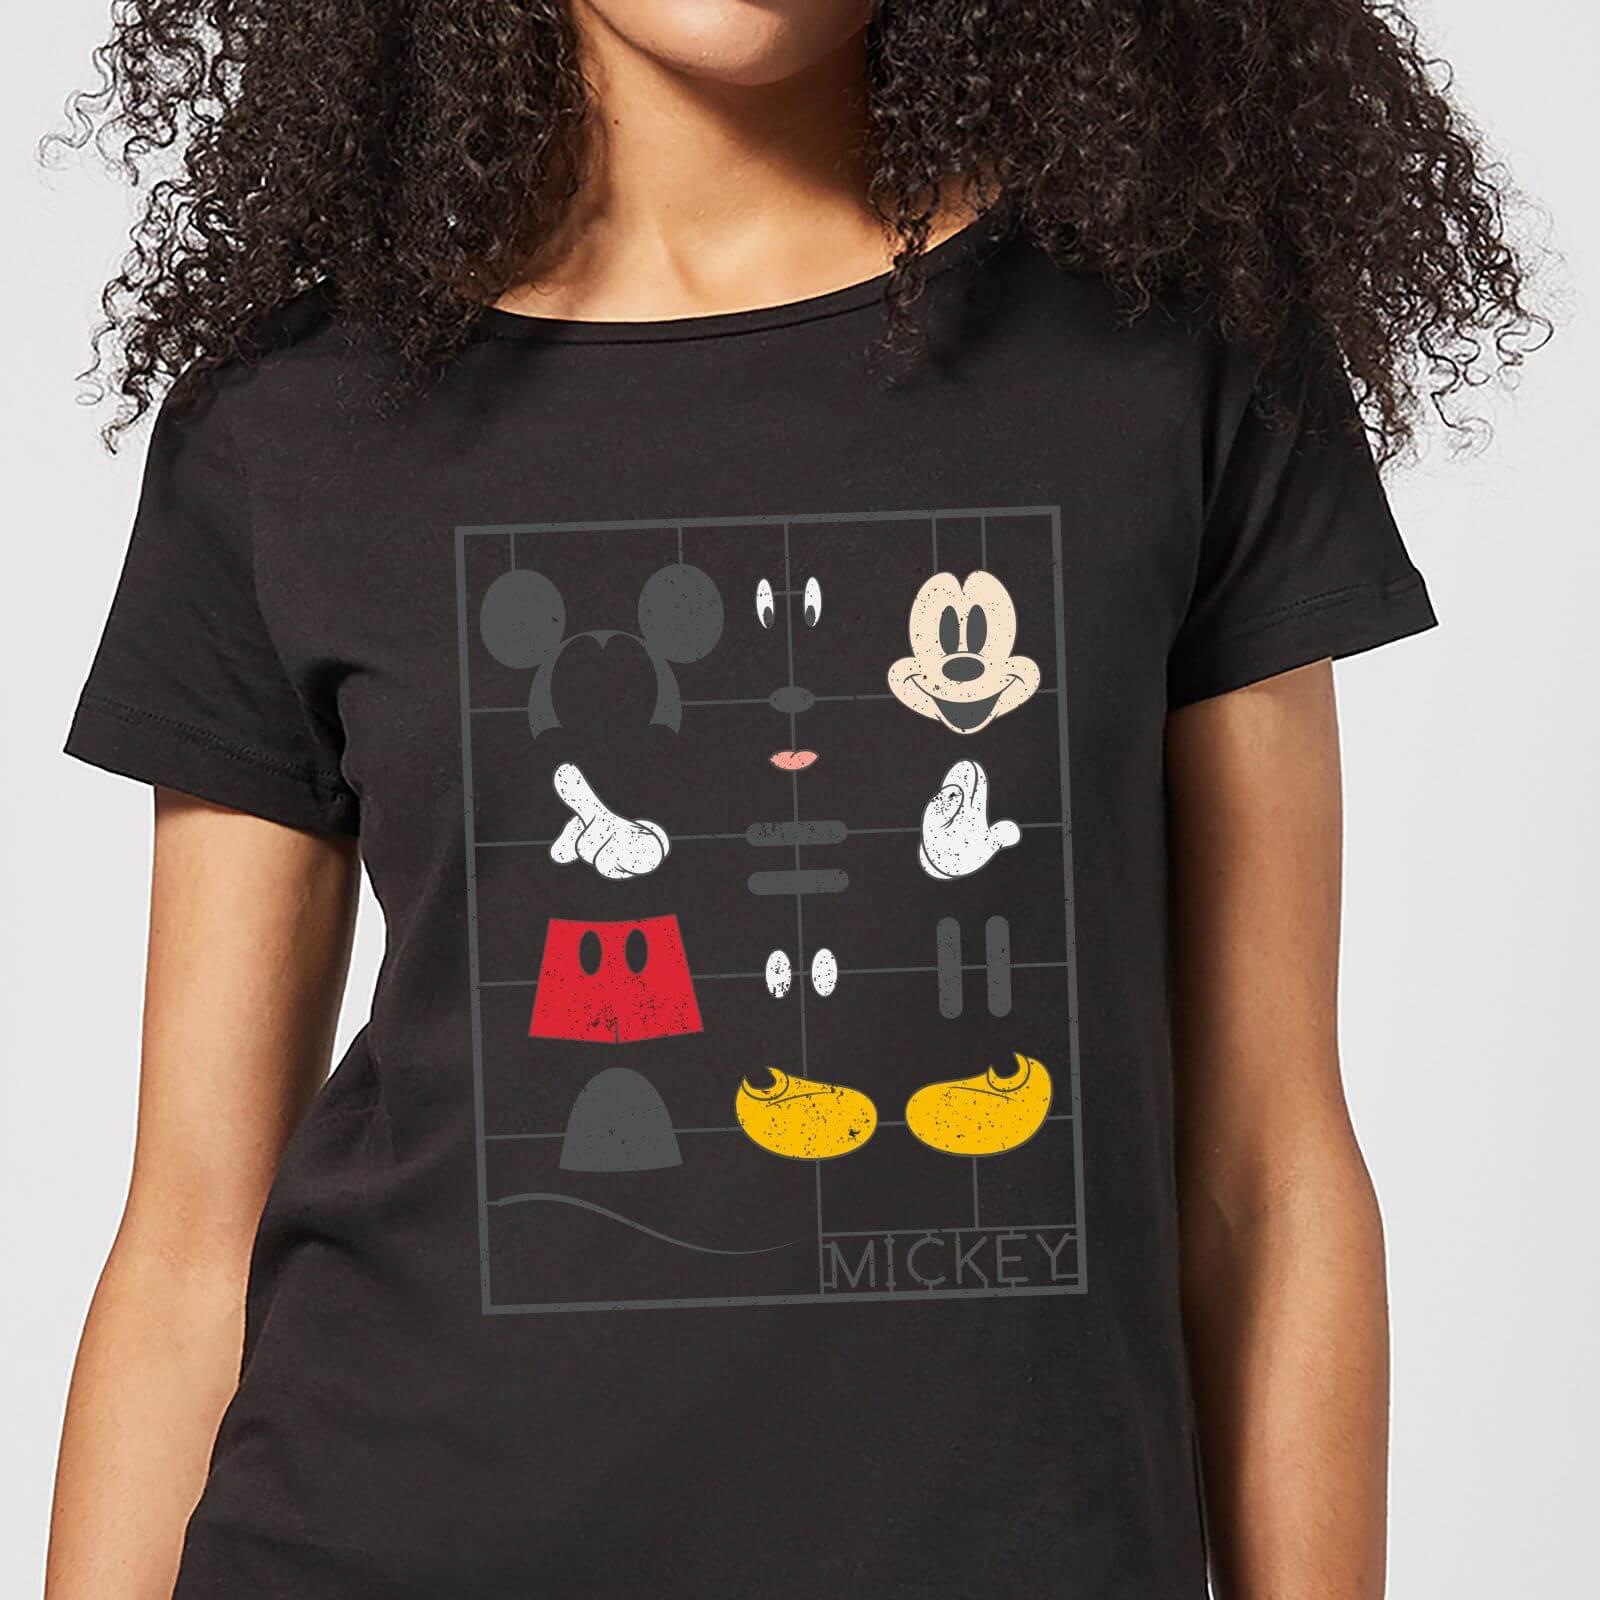 Disney Disney Mickey Mouse Construction Kit Women's T-Shirt - Black - S - Black